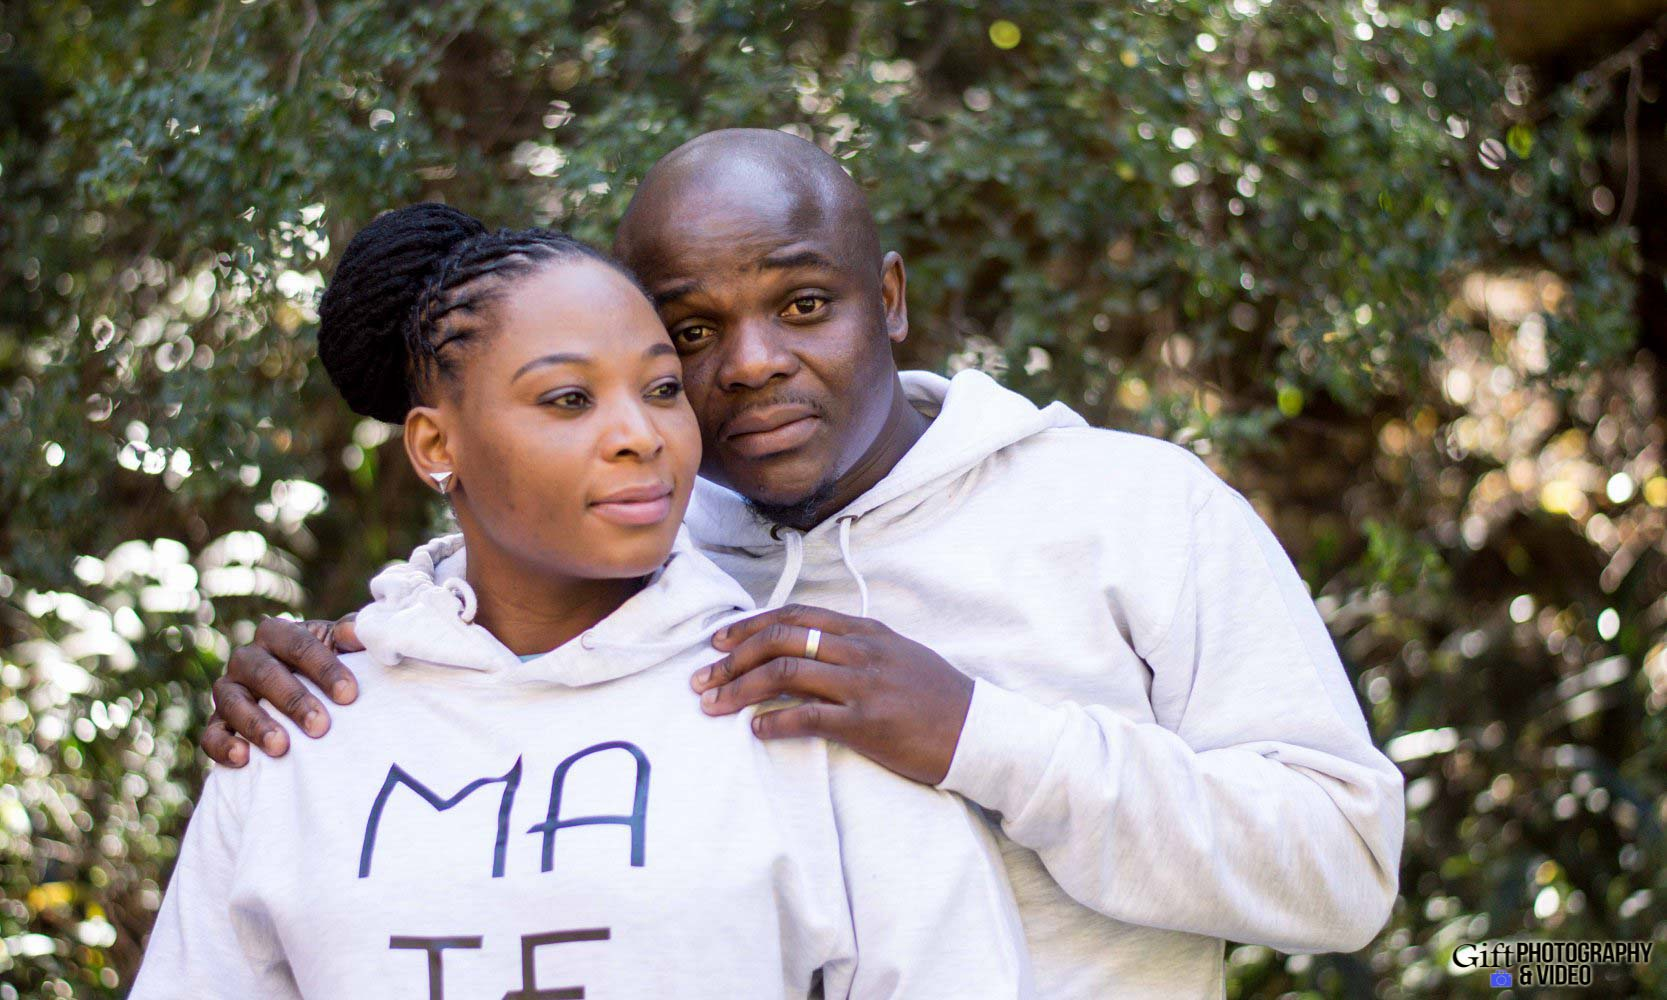 azania-bafana-engagement-8